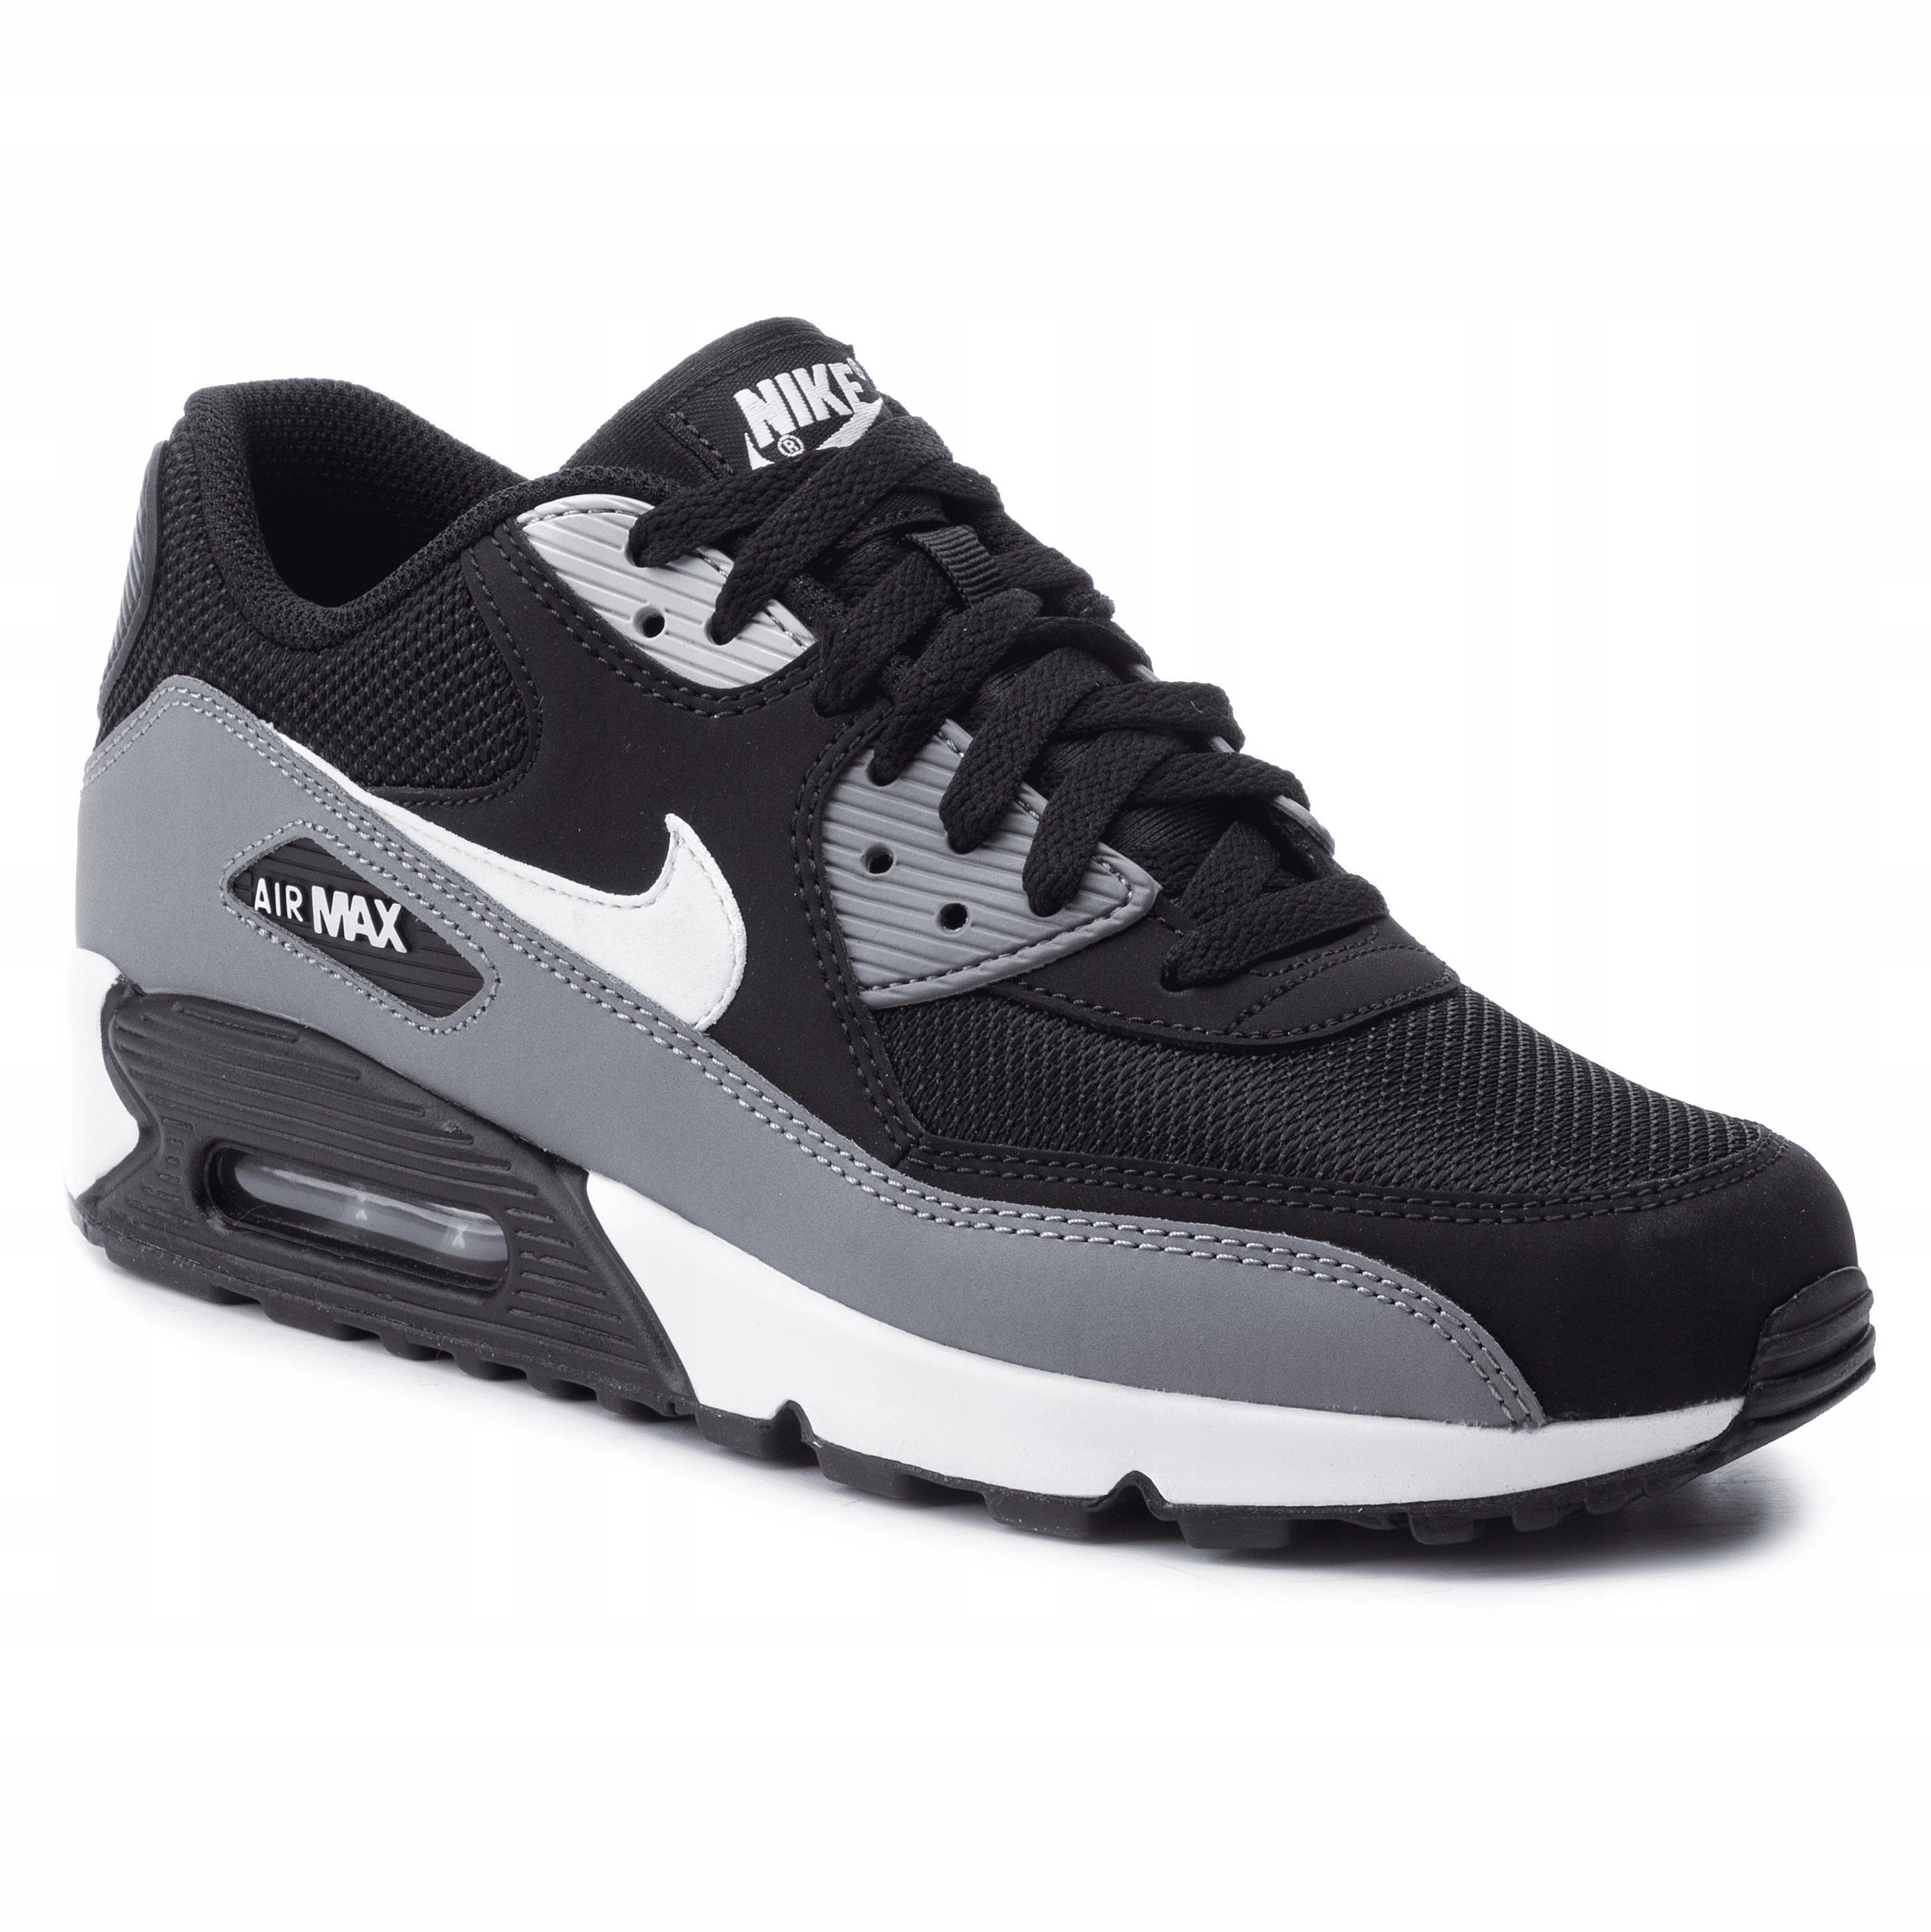 Buty męskie Nike Air Max 90 537384 090 r.41 do 46 Zdjęcie